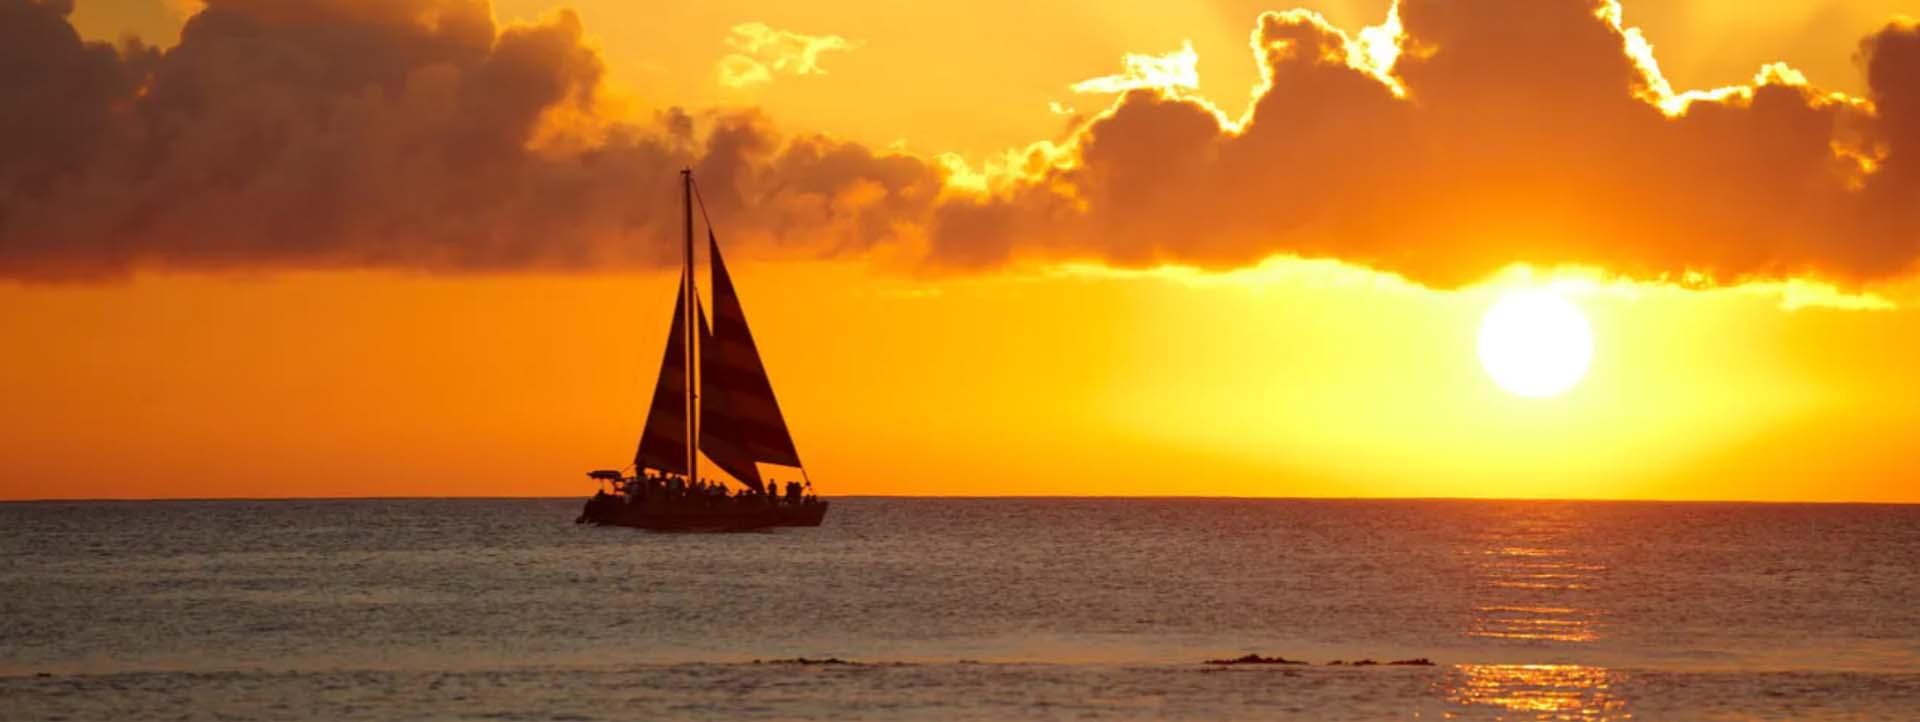 ORCAELLA Whale Watching Sunset Boat Tours